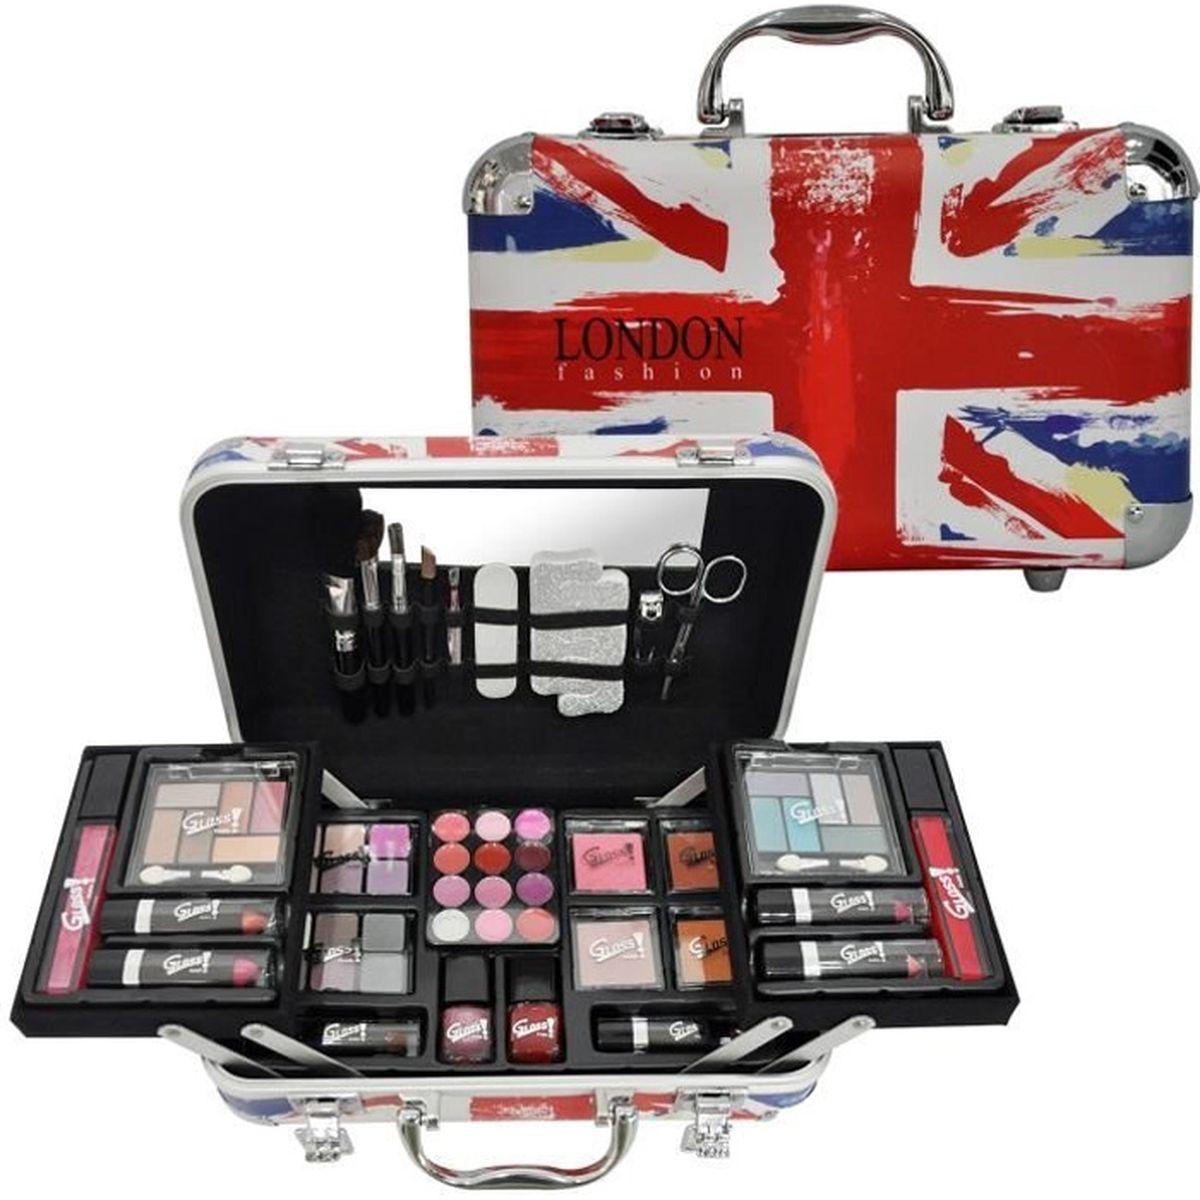 malette maquillage femme achat vente malette maquillage femme pas cher soldes d s le 10. Black Bedroom Furniture Sets. Home Design Ideas